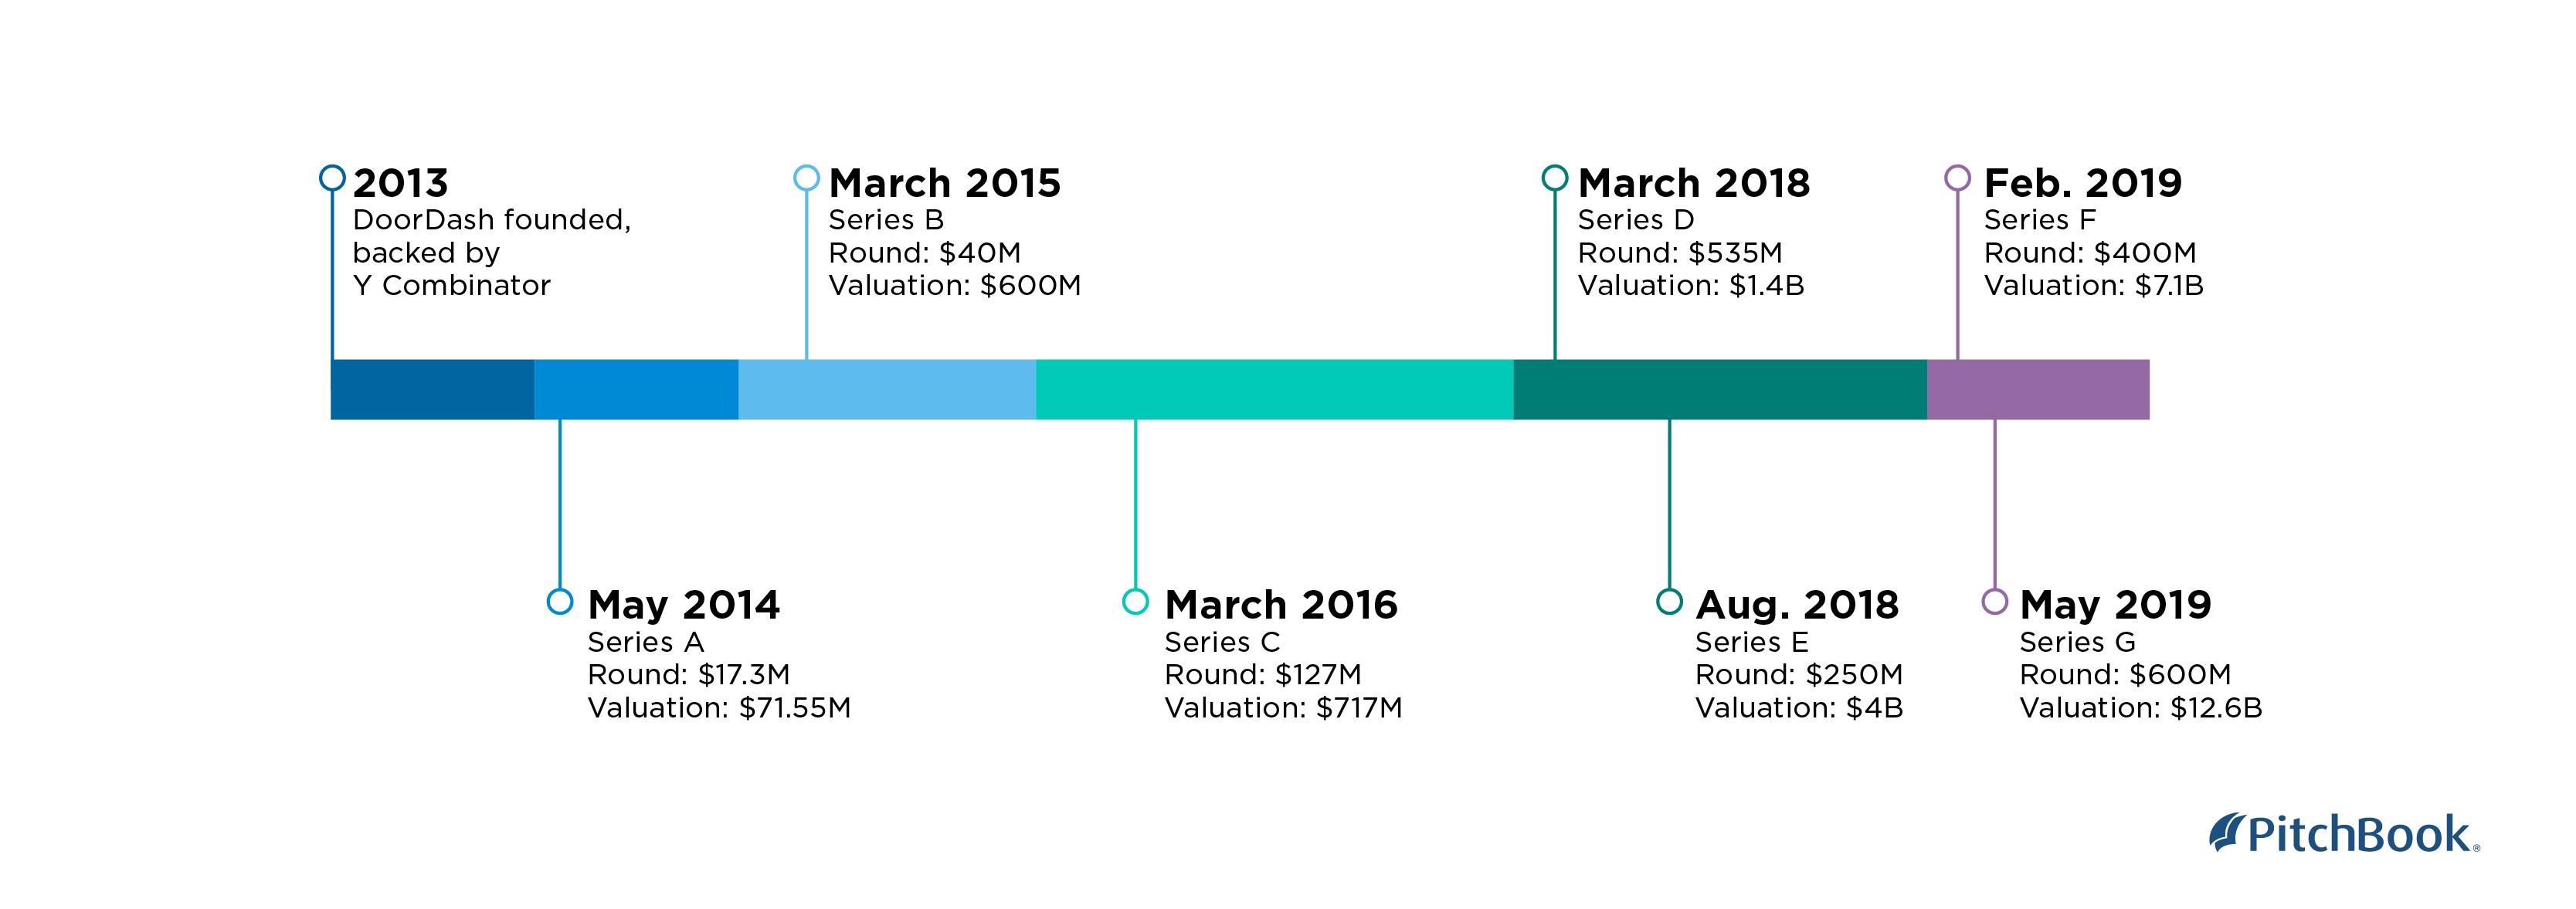 DoorDash picks up $600M Series G as valuation soars | PitchBook